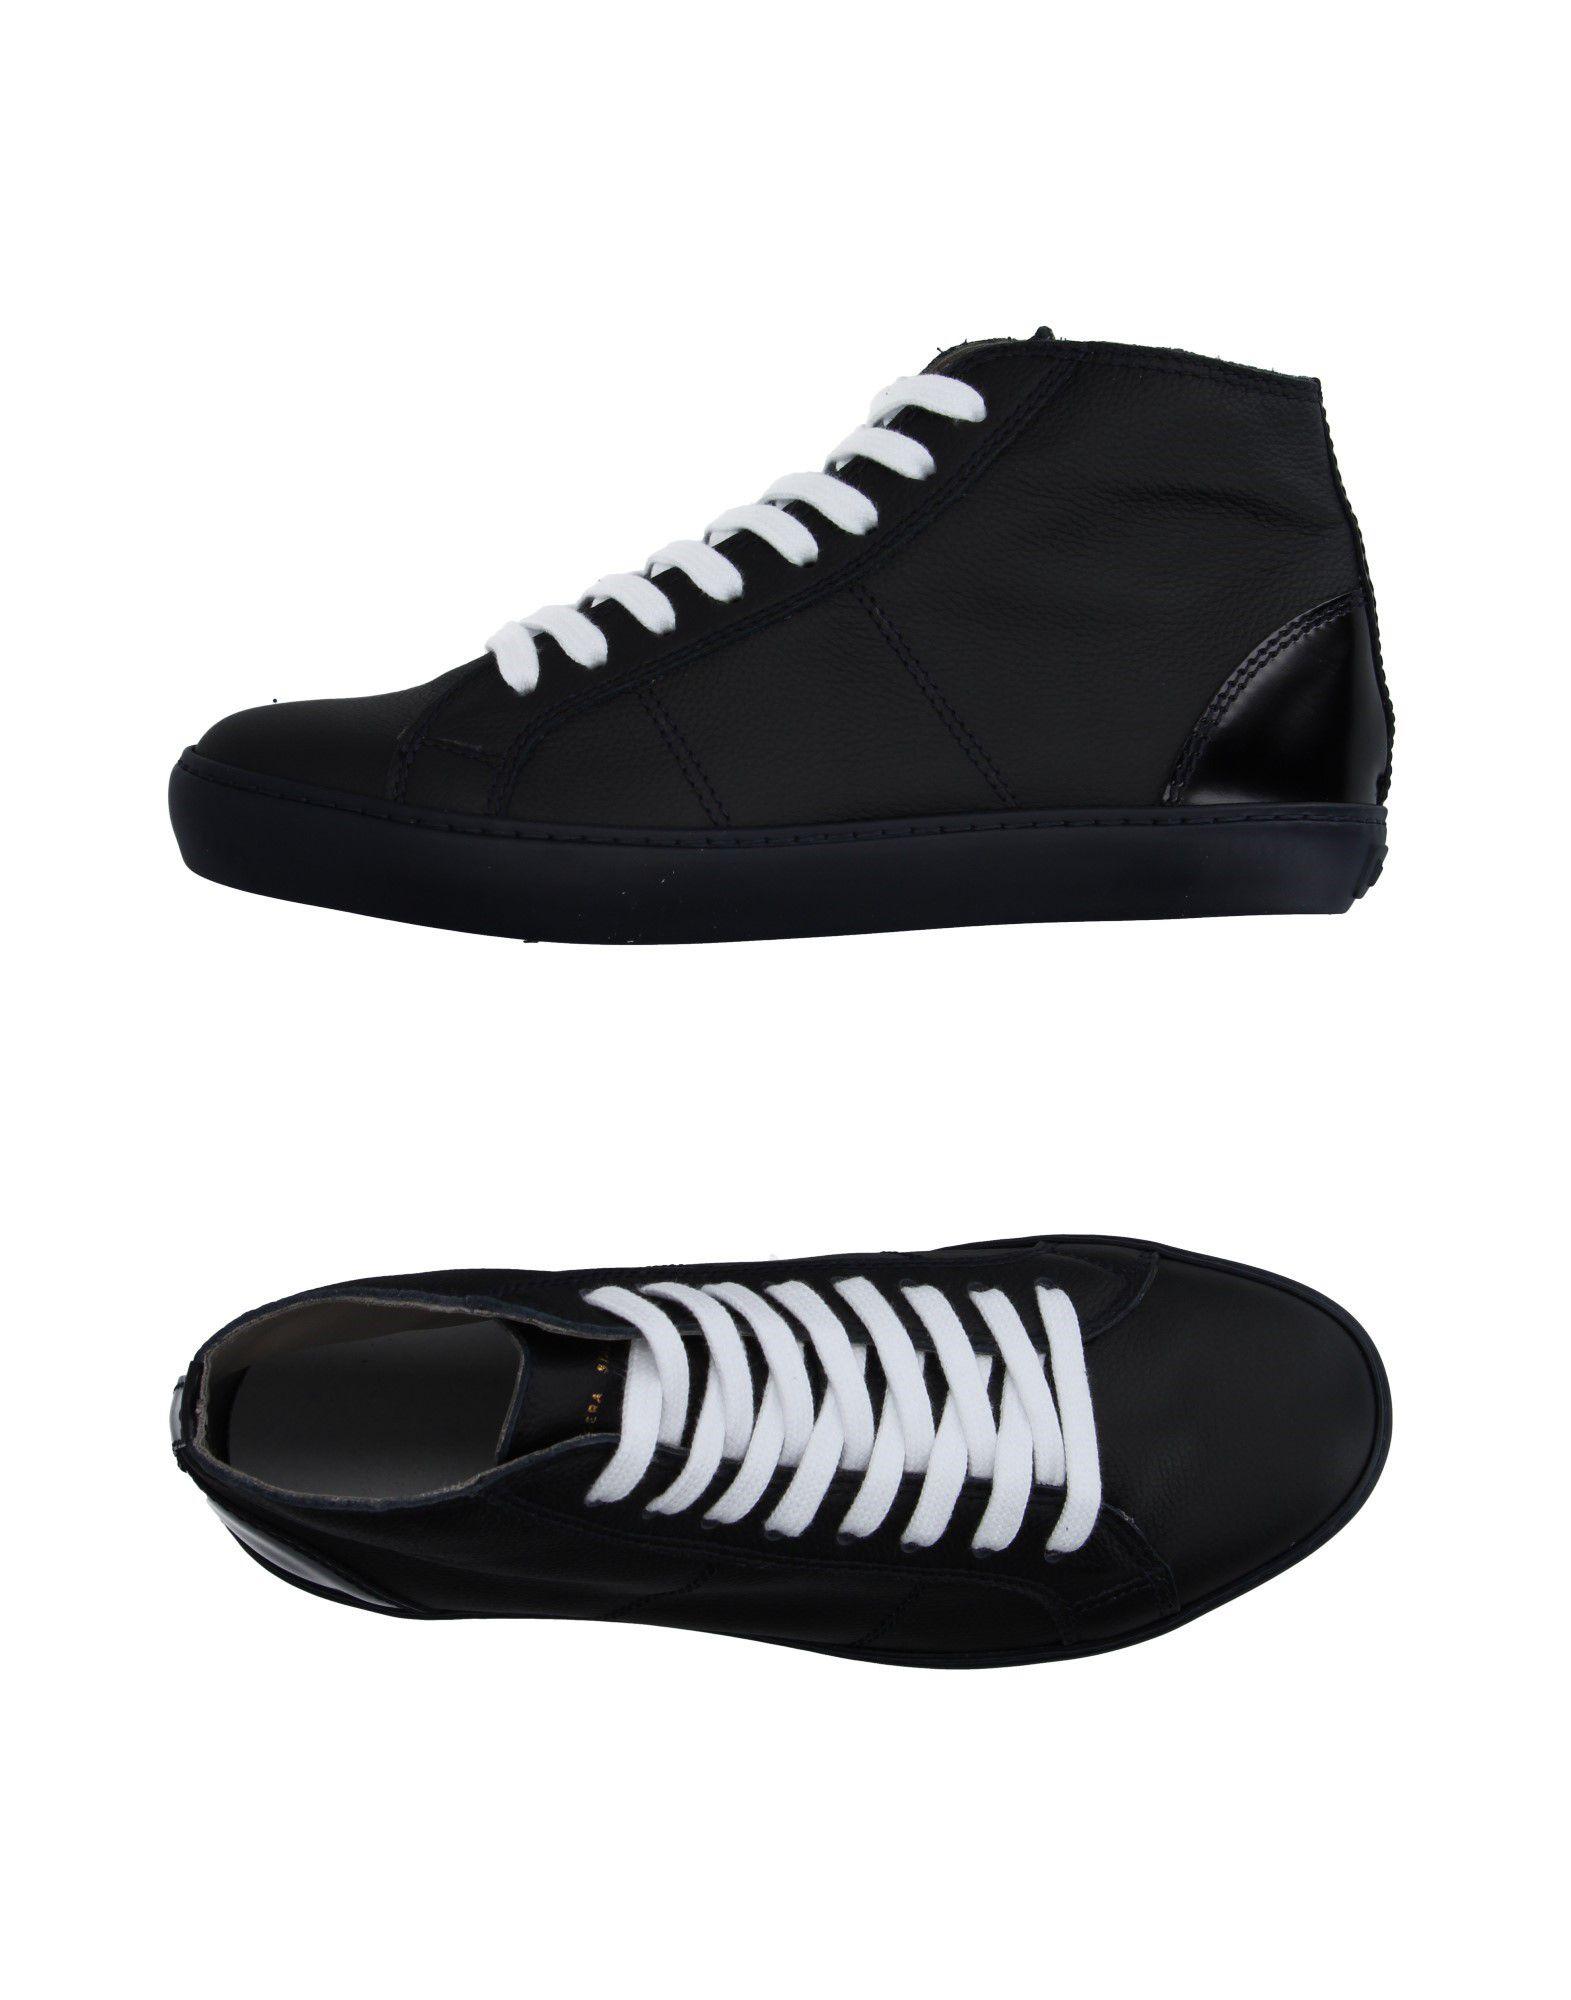 Sneakers Pantofola D'oro Donna - 11103296OI